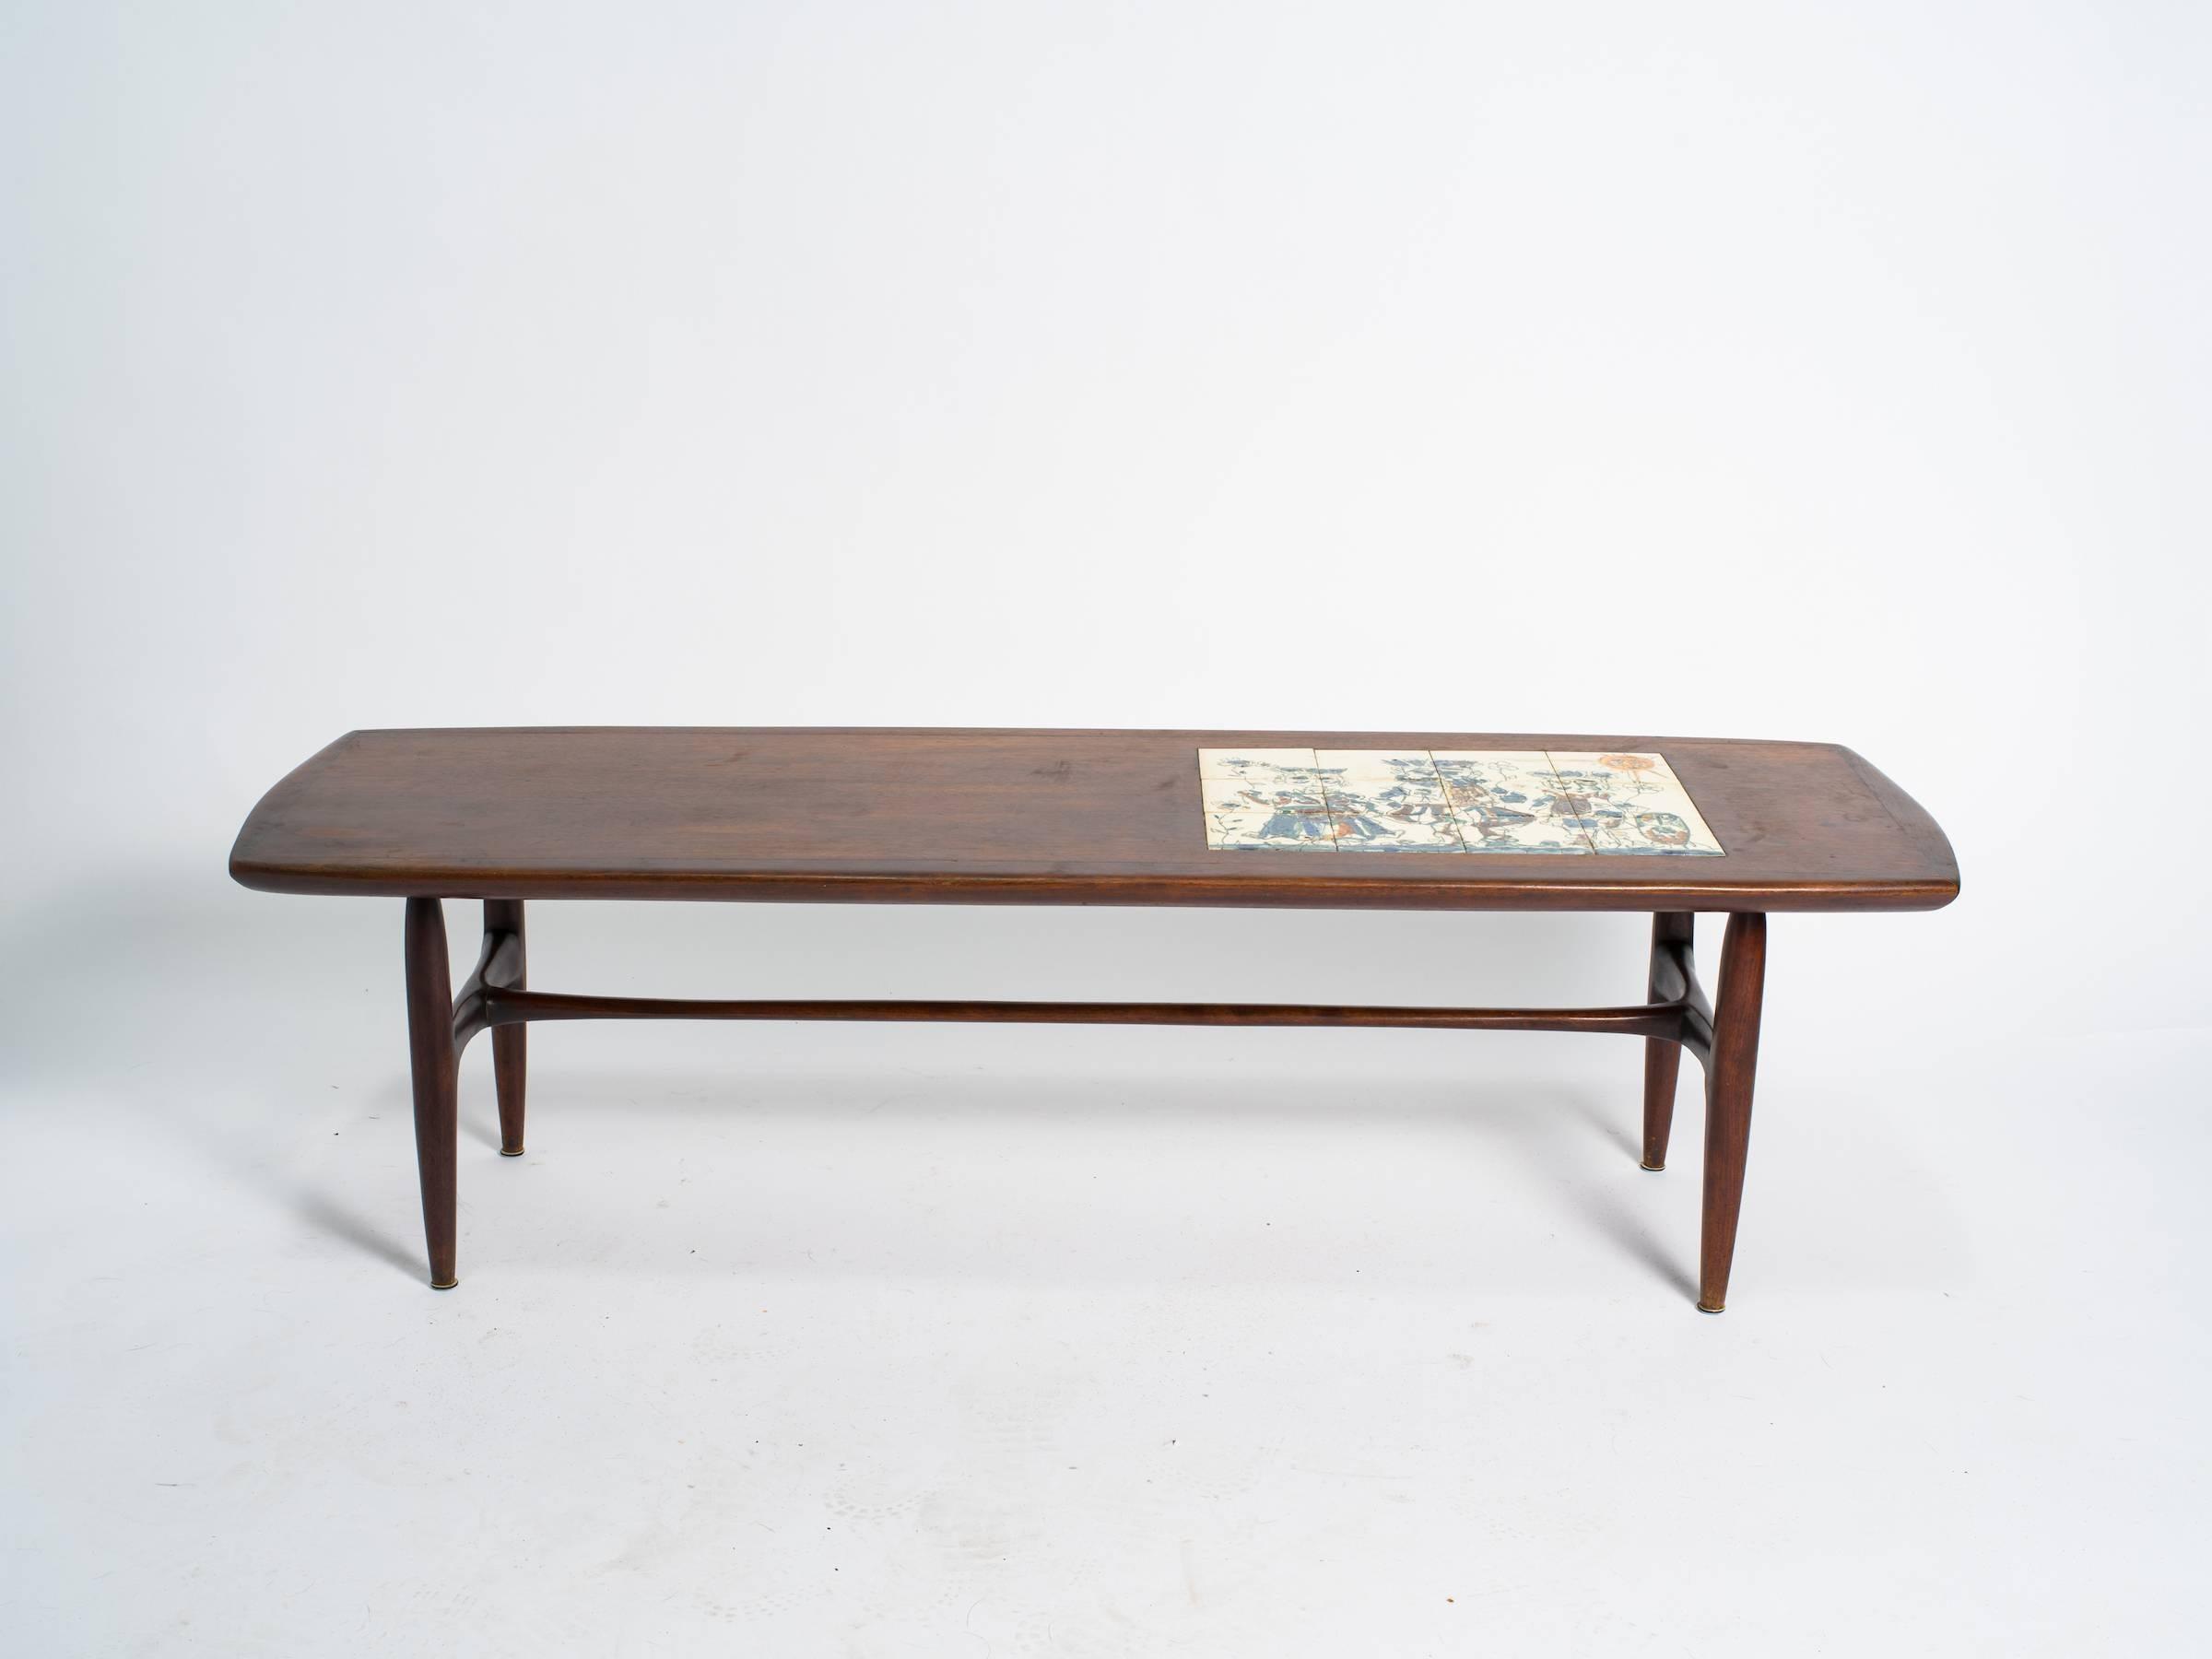 Alvin Hollingsworth Tile Top Teak Coffee Table At 1stdibs